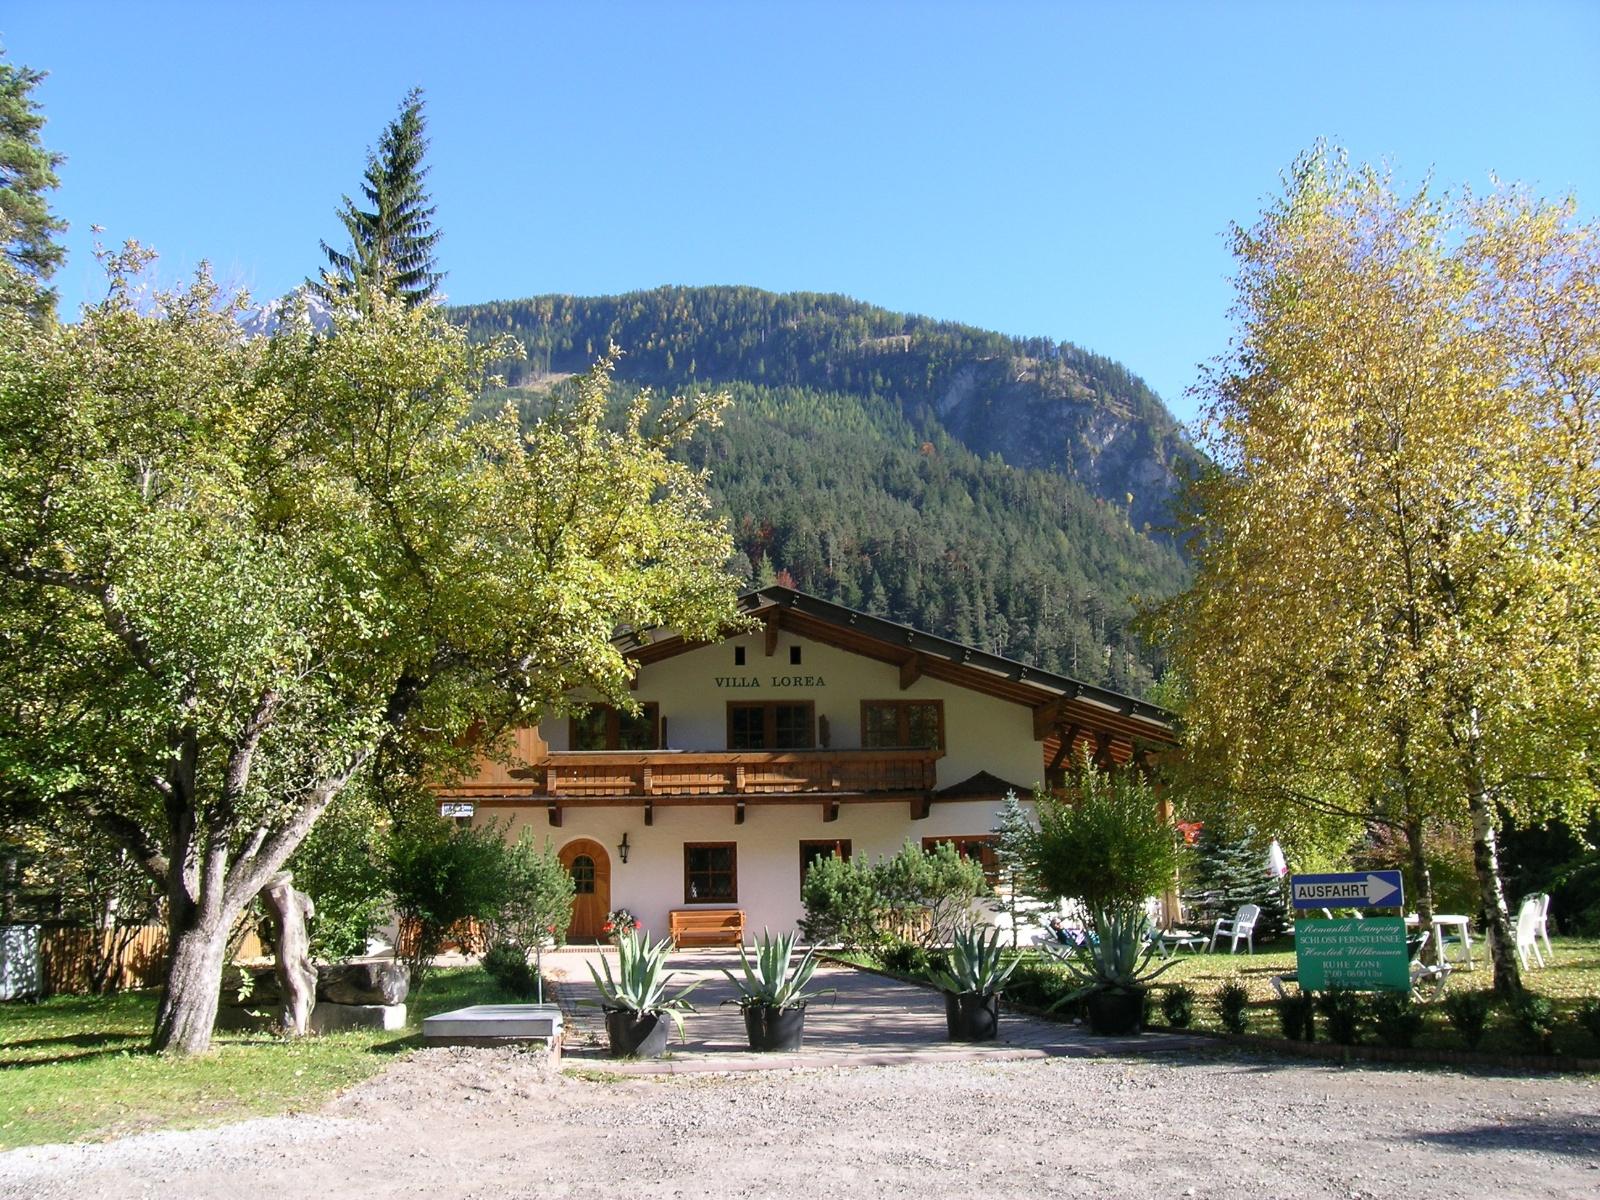 Hotel Schloss Fernsteinsee Villa Lorea